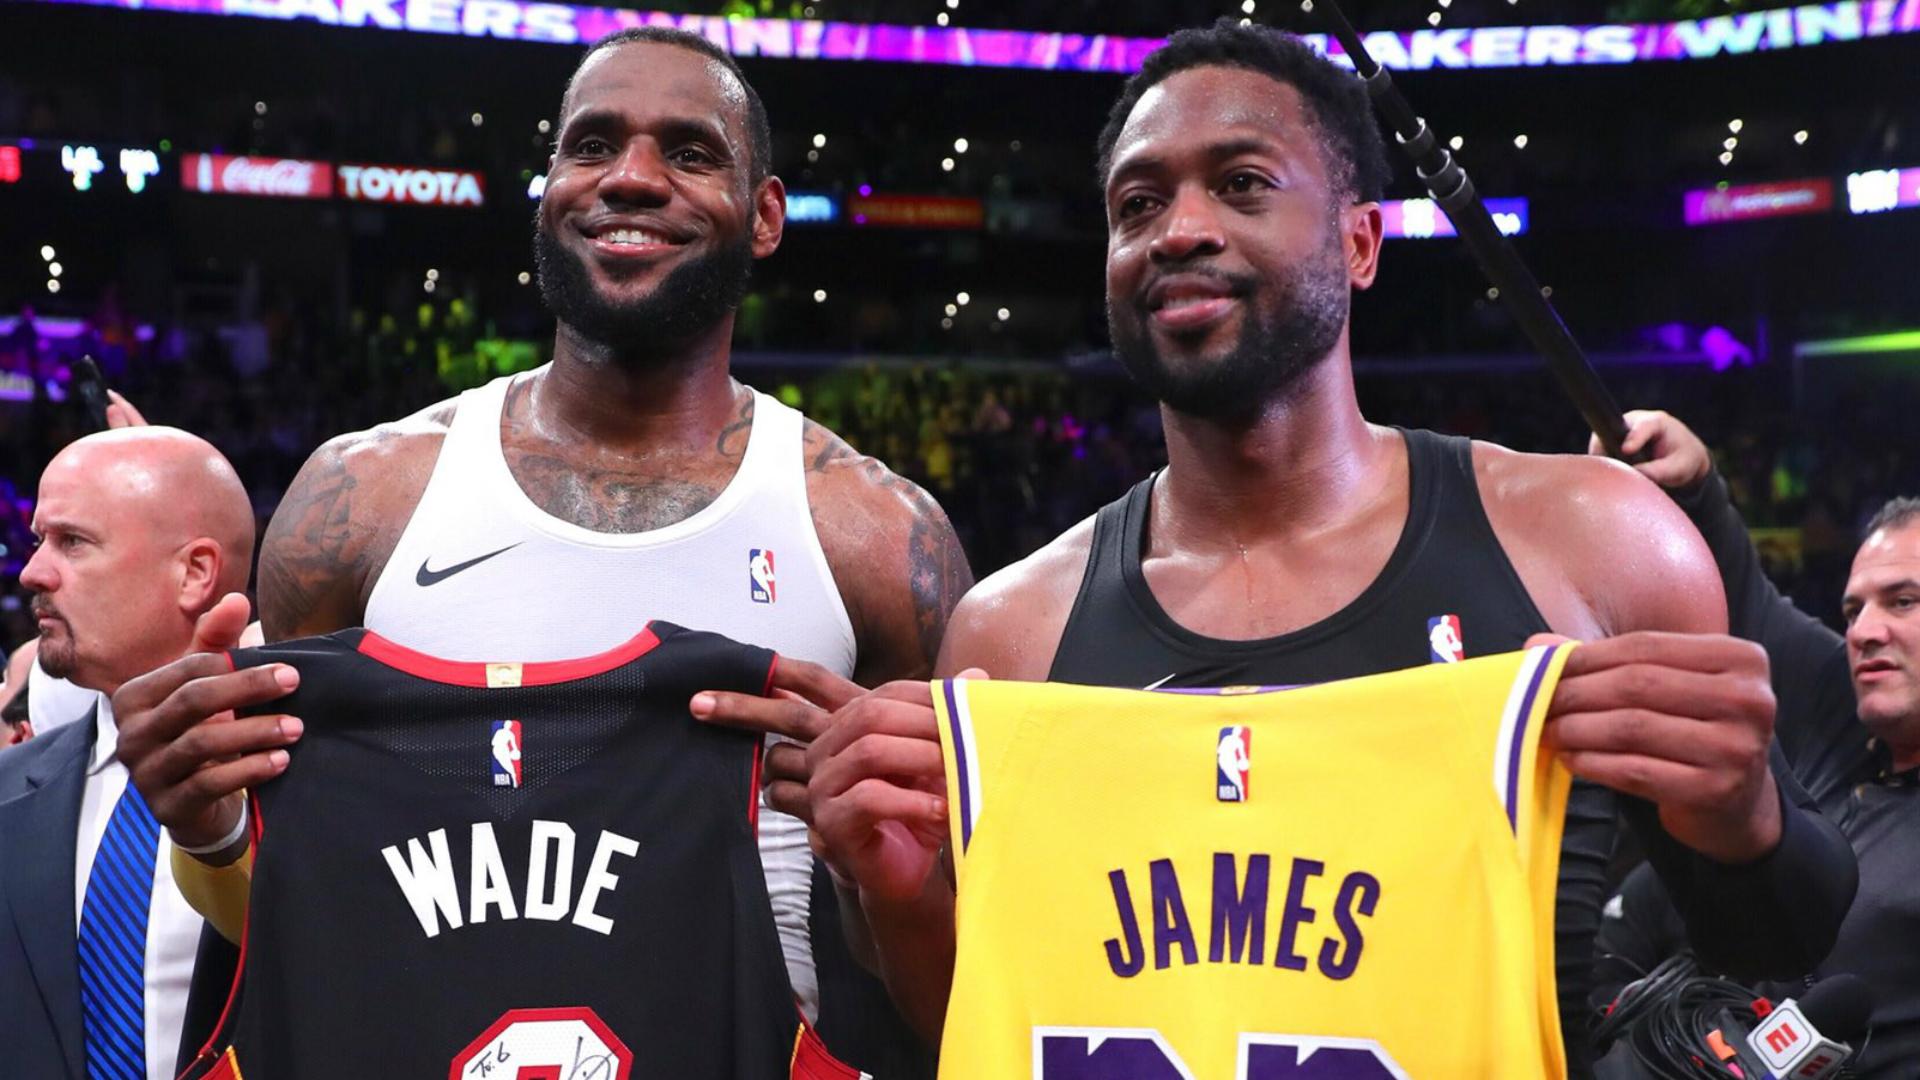 Sons of LeBron James, Dwyane Wade teaming up in high school